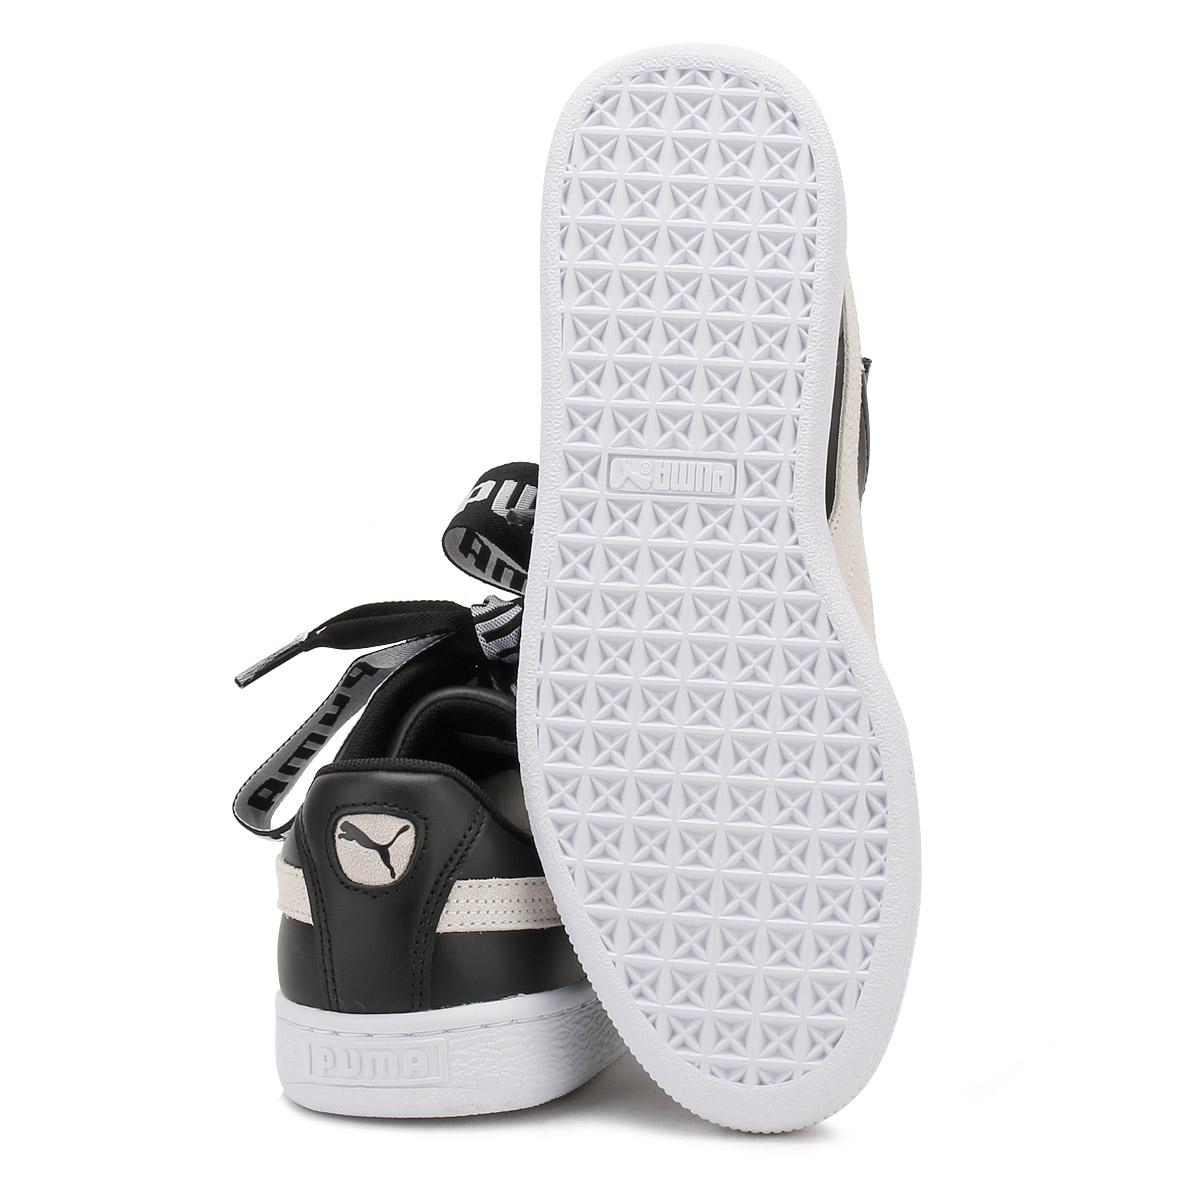 Descuento por tiempo limitado PUMA Womens Basket Heart DE Trainers, Satin Ribbon Chunky Lace, Leather Shoes